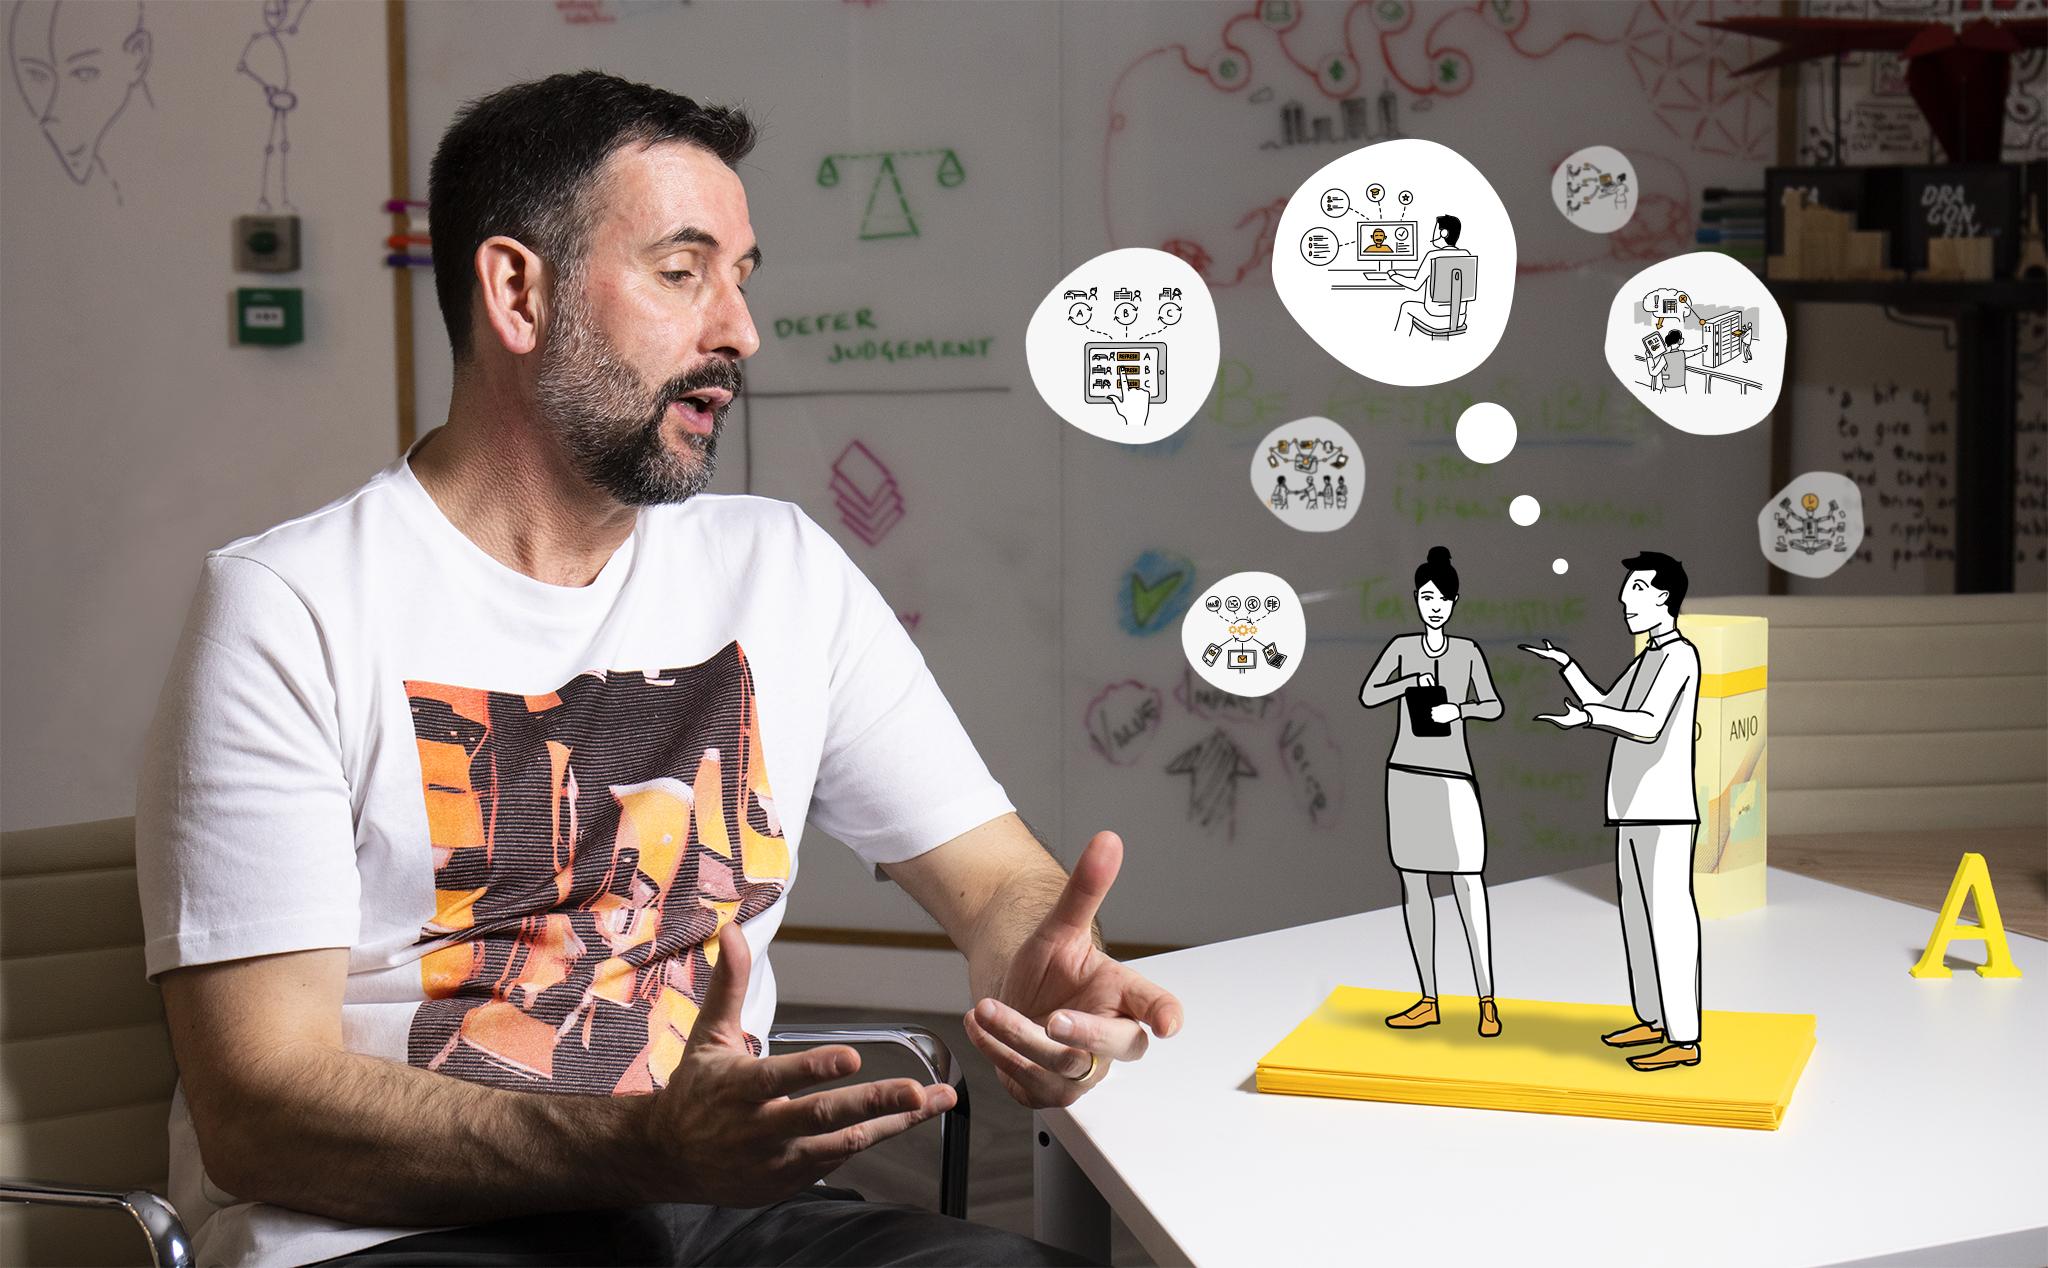 Main visual : Co-creating in a virtual world